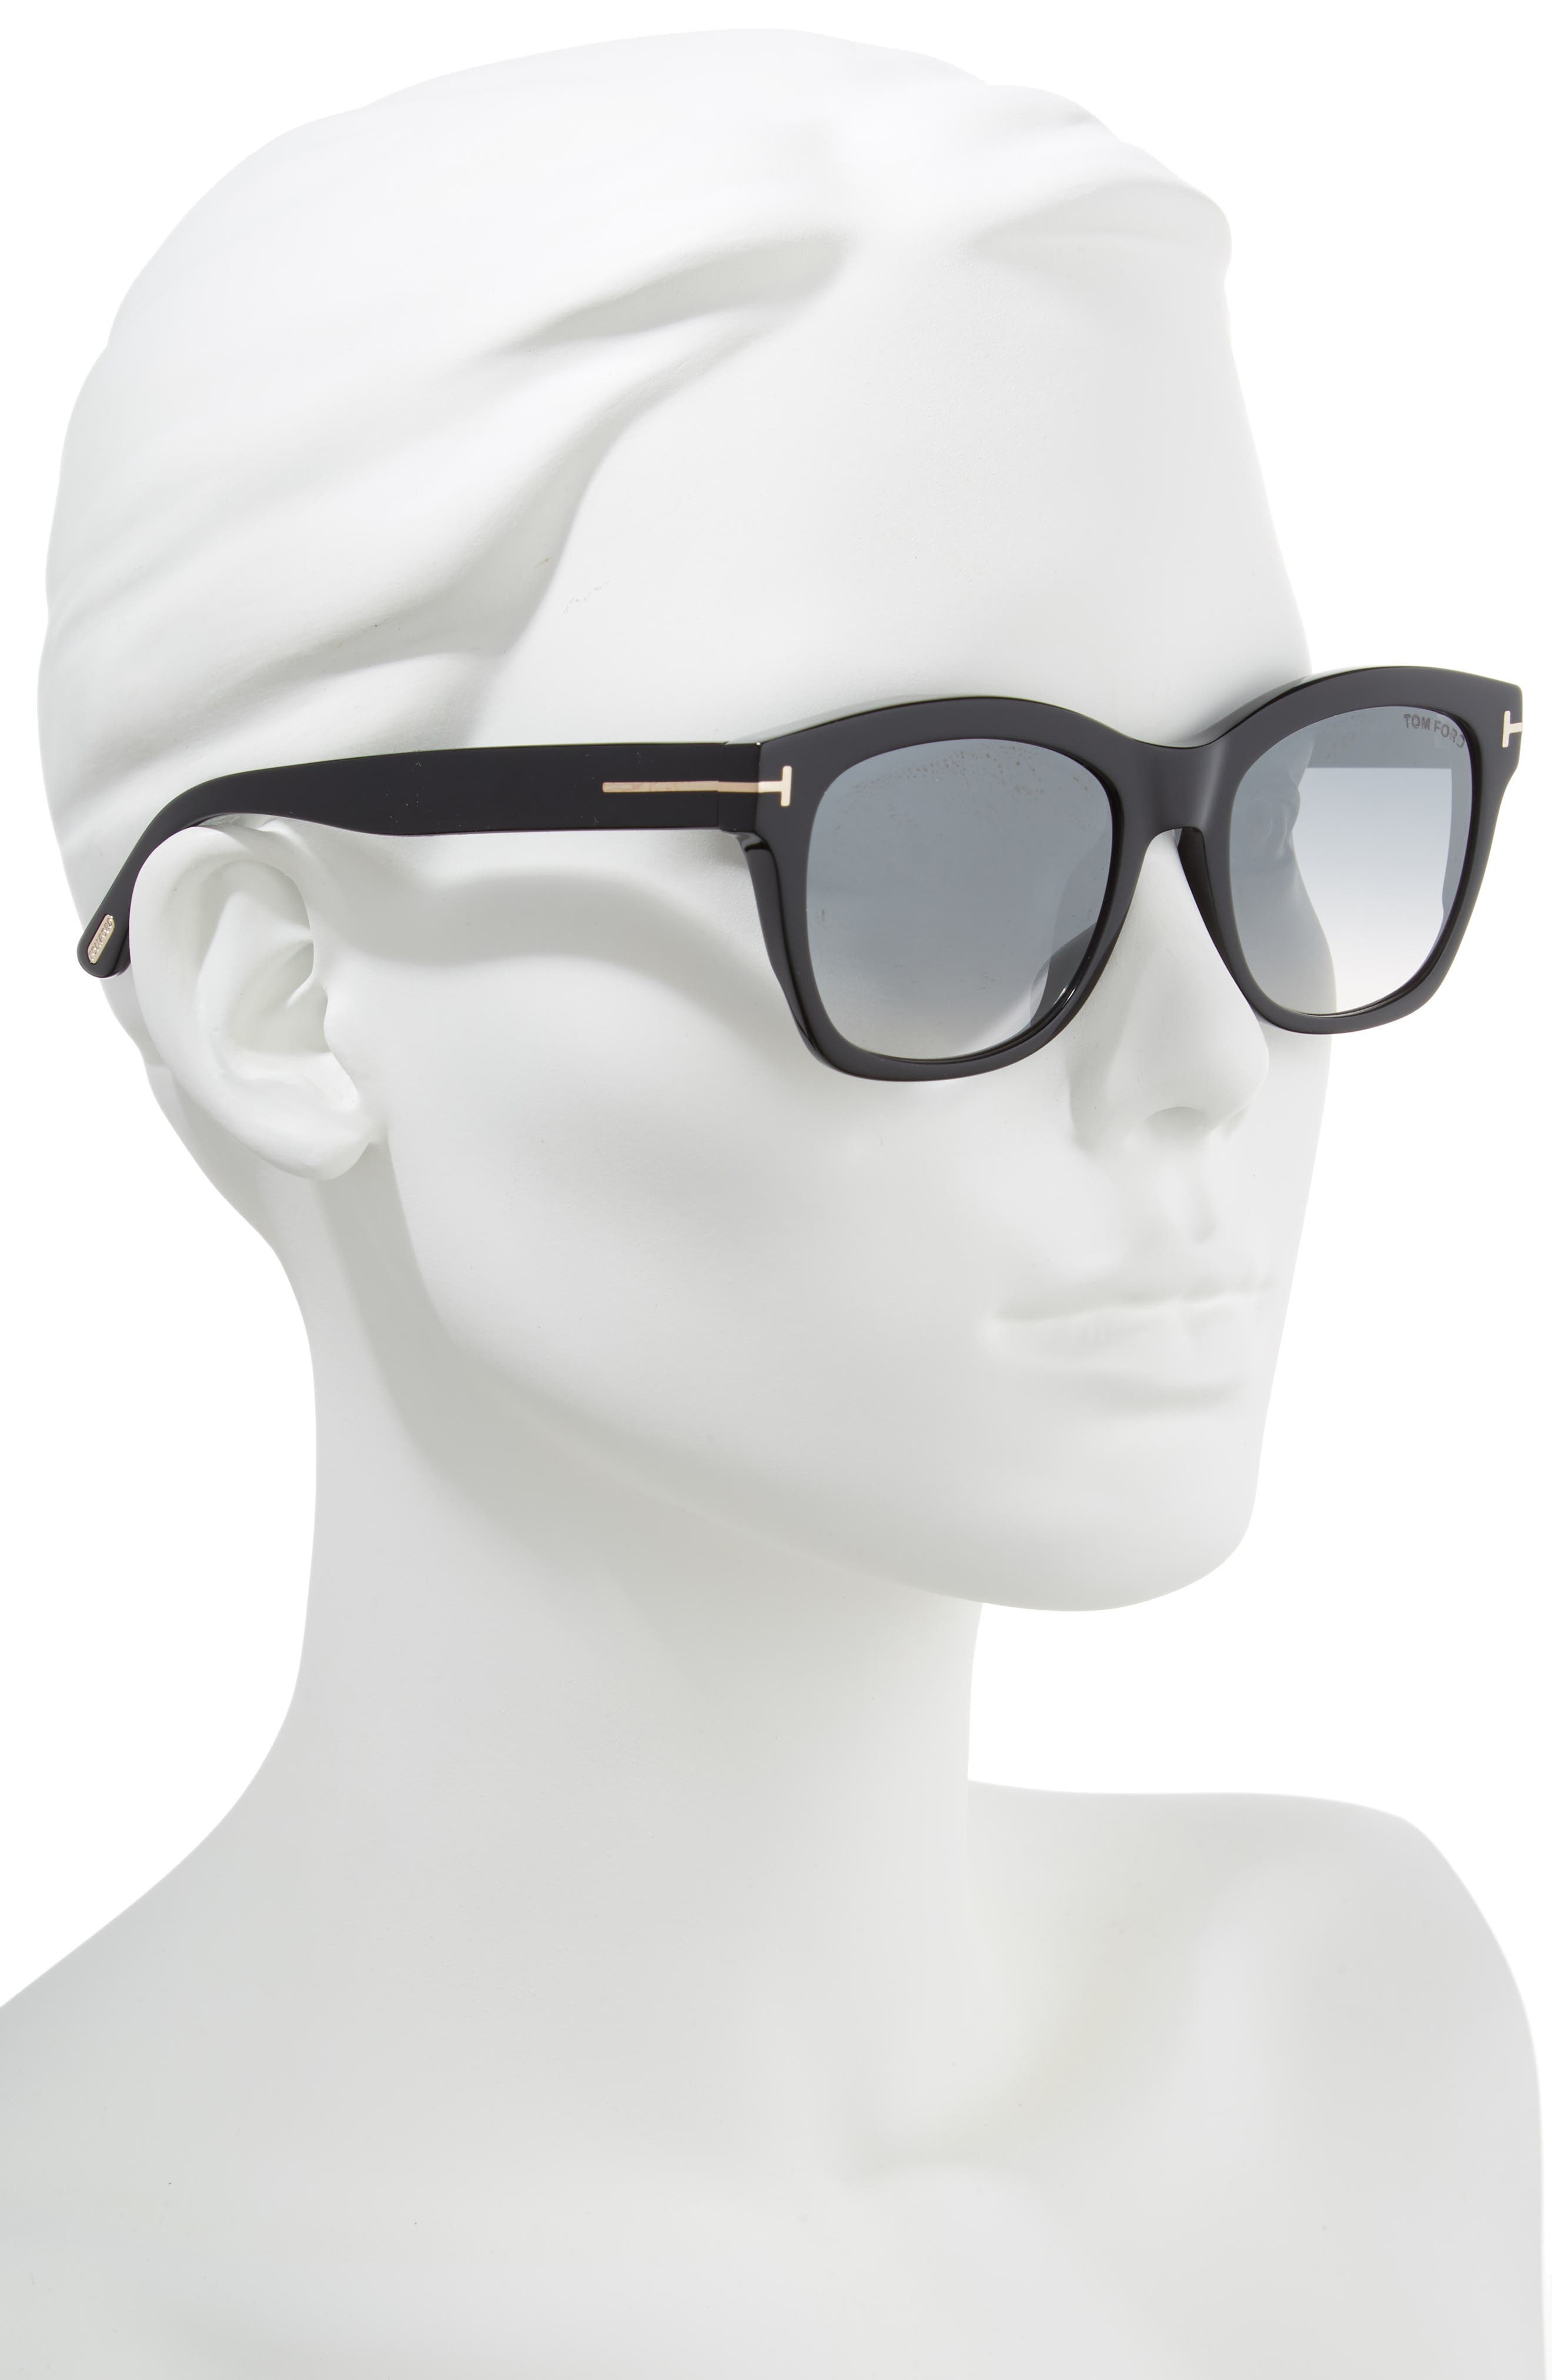 Lauren 52mm Sunglasses,                             Alternate thumbnail 2, color,                             SHINY BLACK/ SMOKE MIRROR